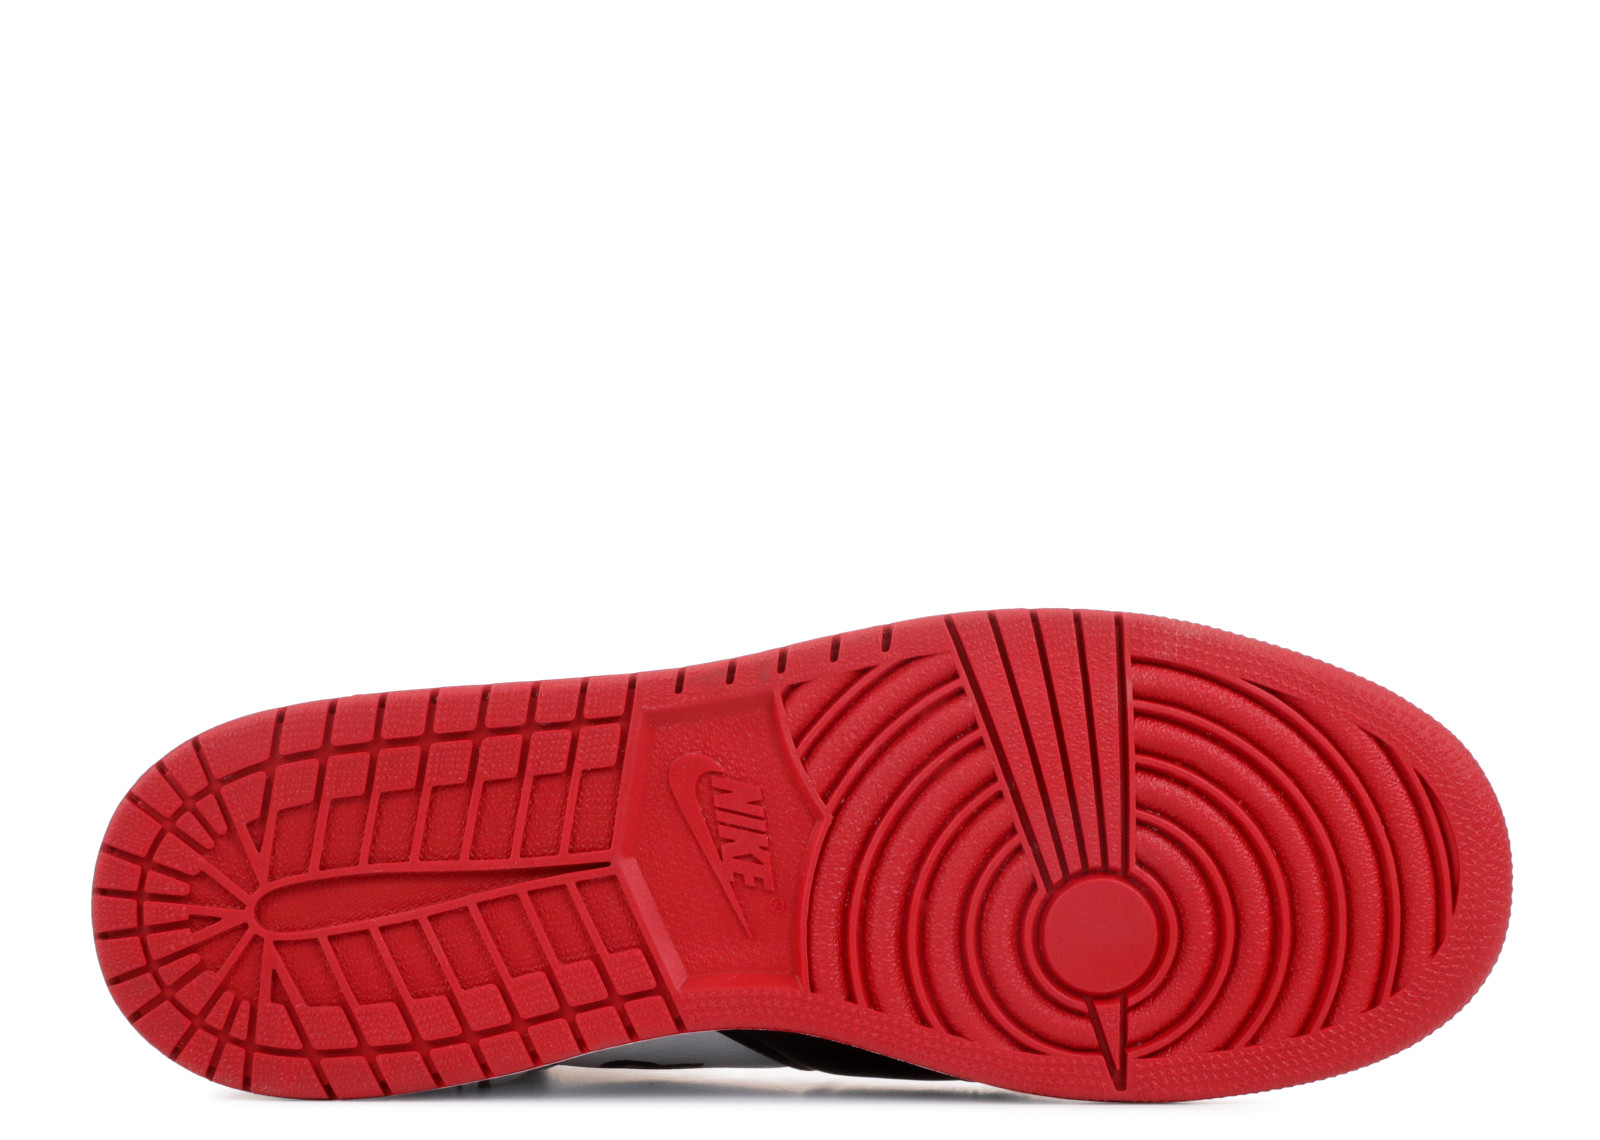 effd9eb7d65 Kick Avenue - Authentic Sneakers